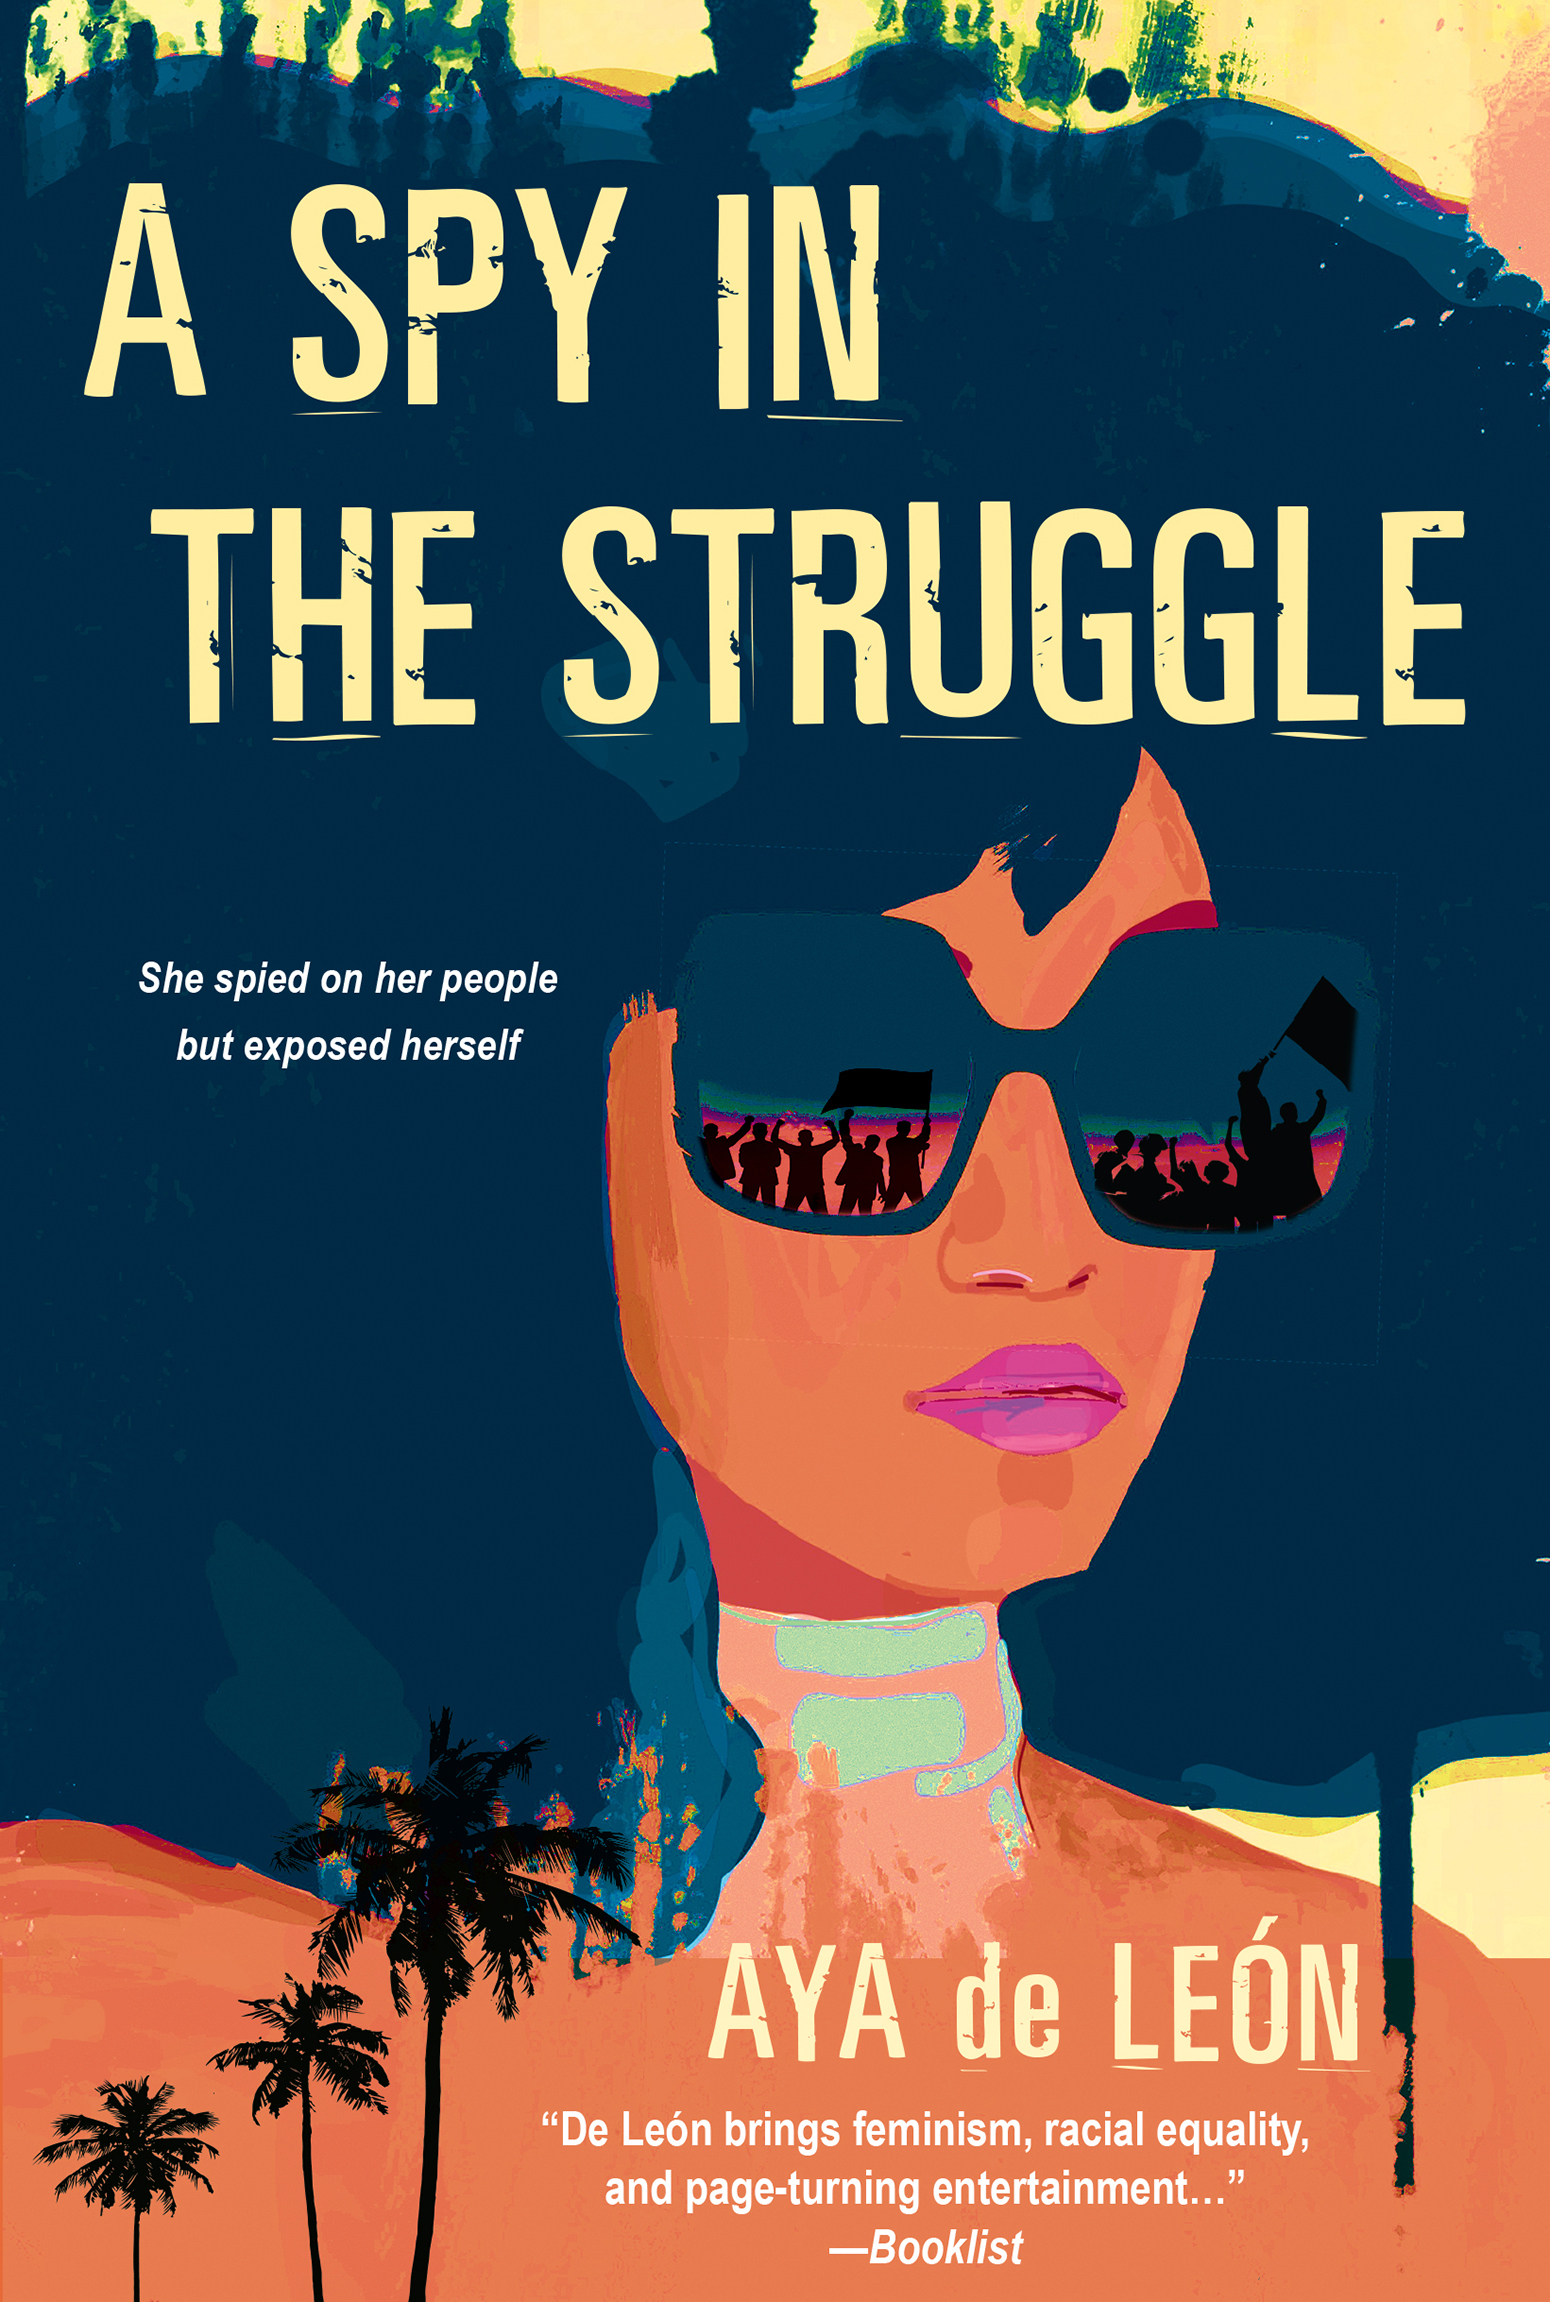 A Spy in the Struggle by Aya de Leon